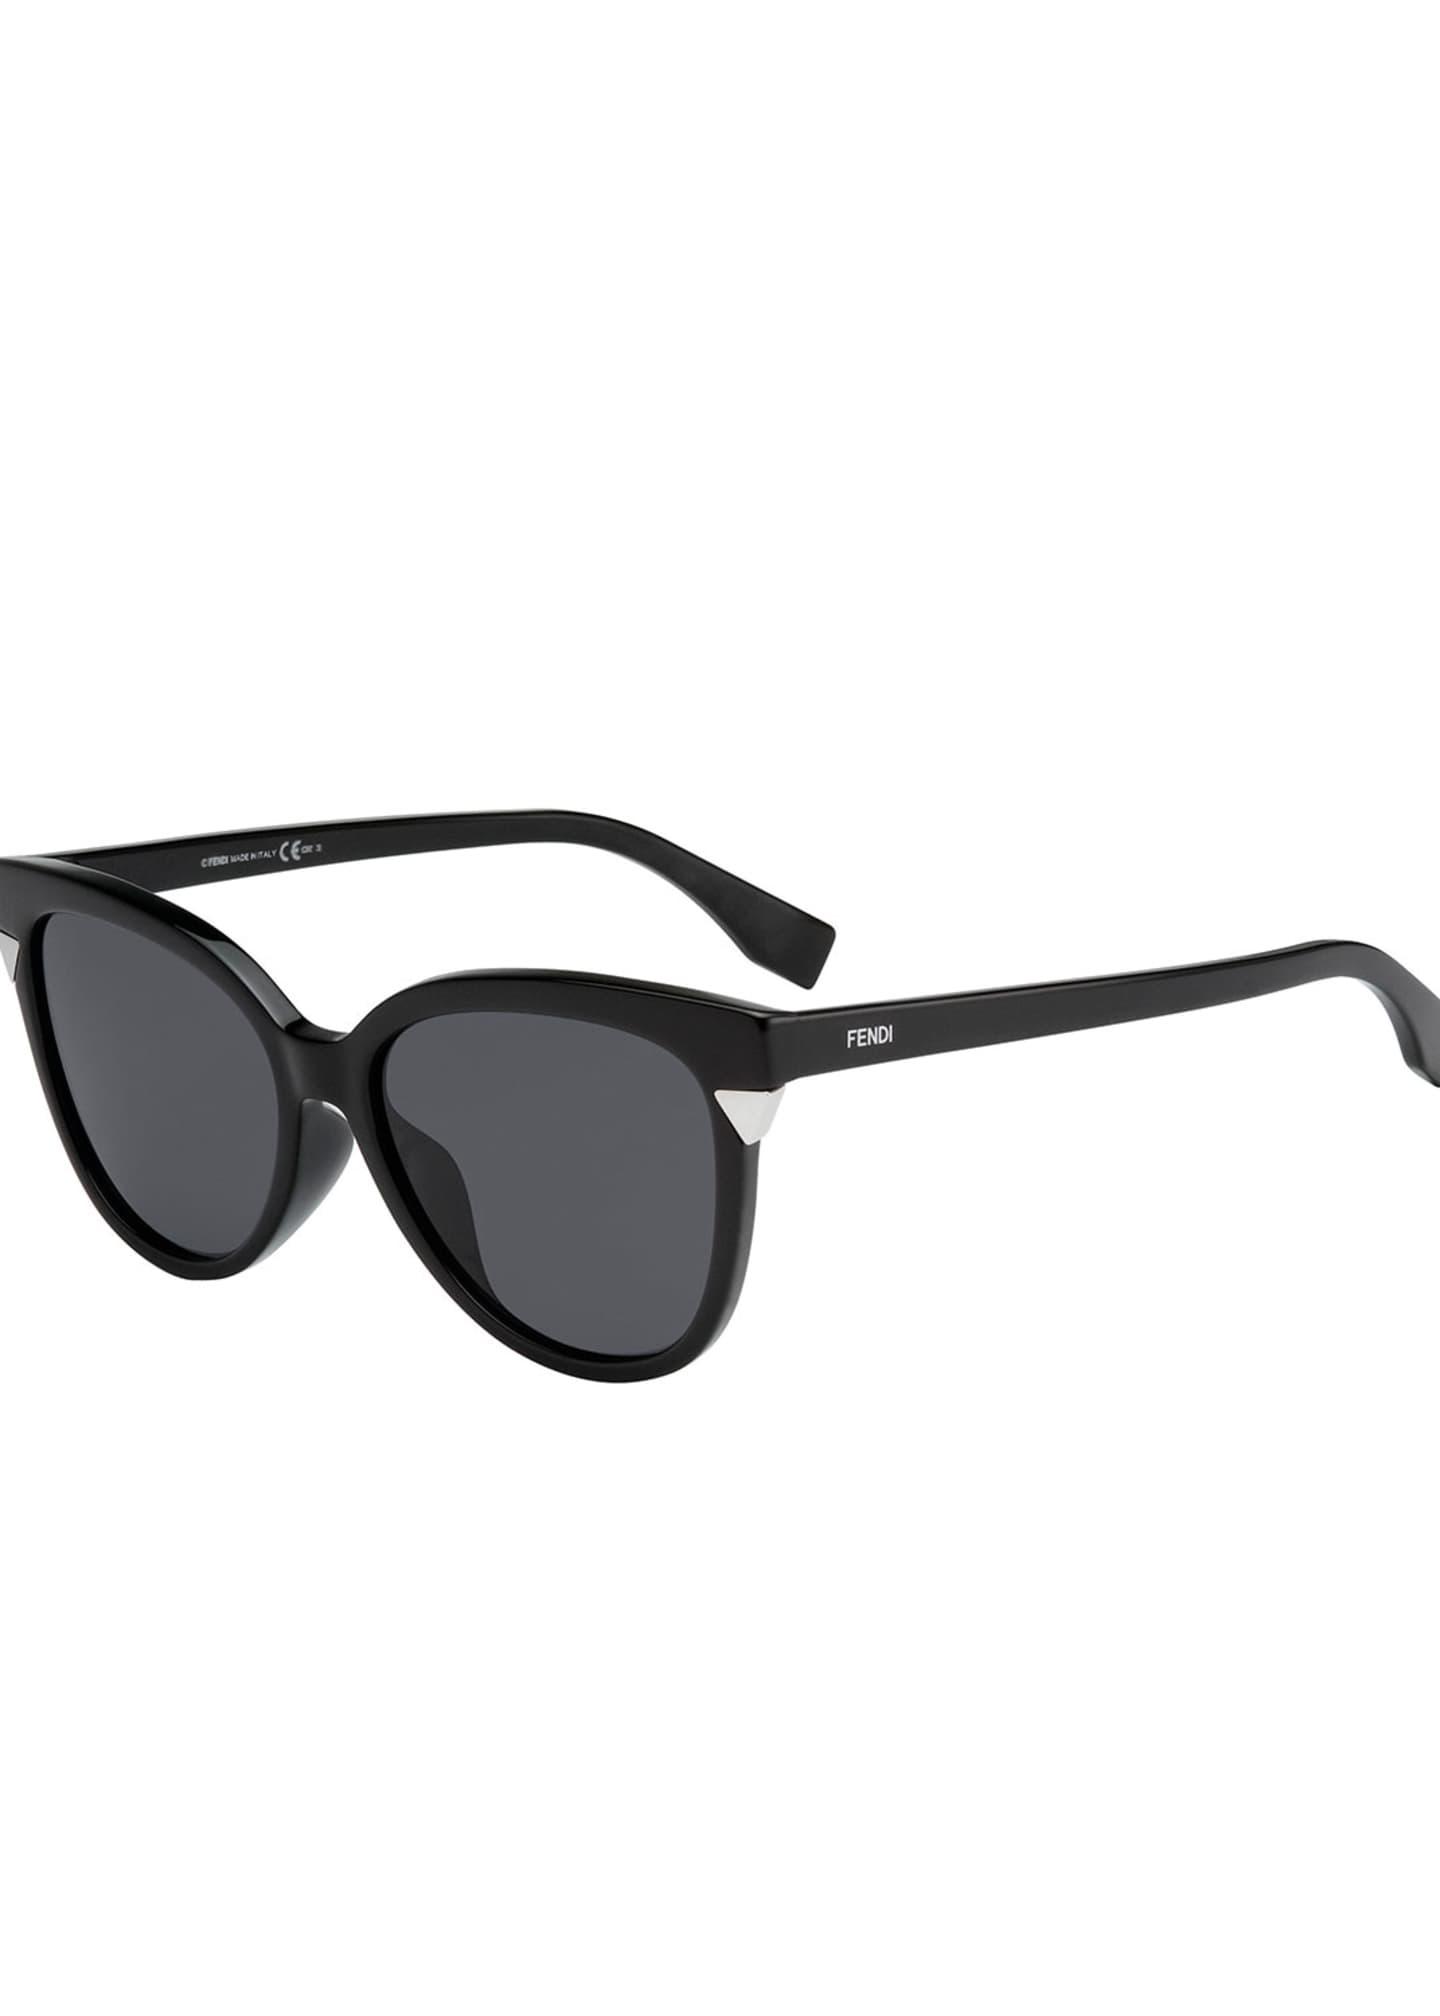 Fendi Round Monochromatic Sunglasses